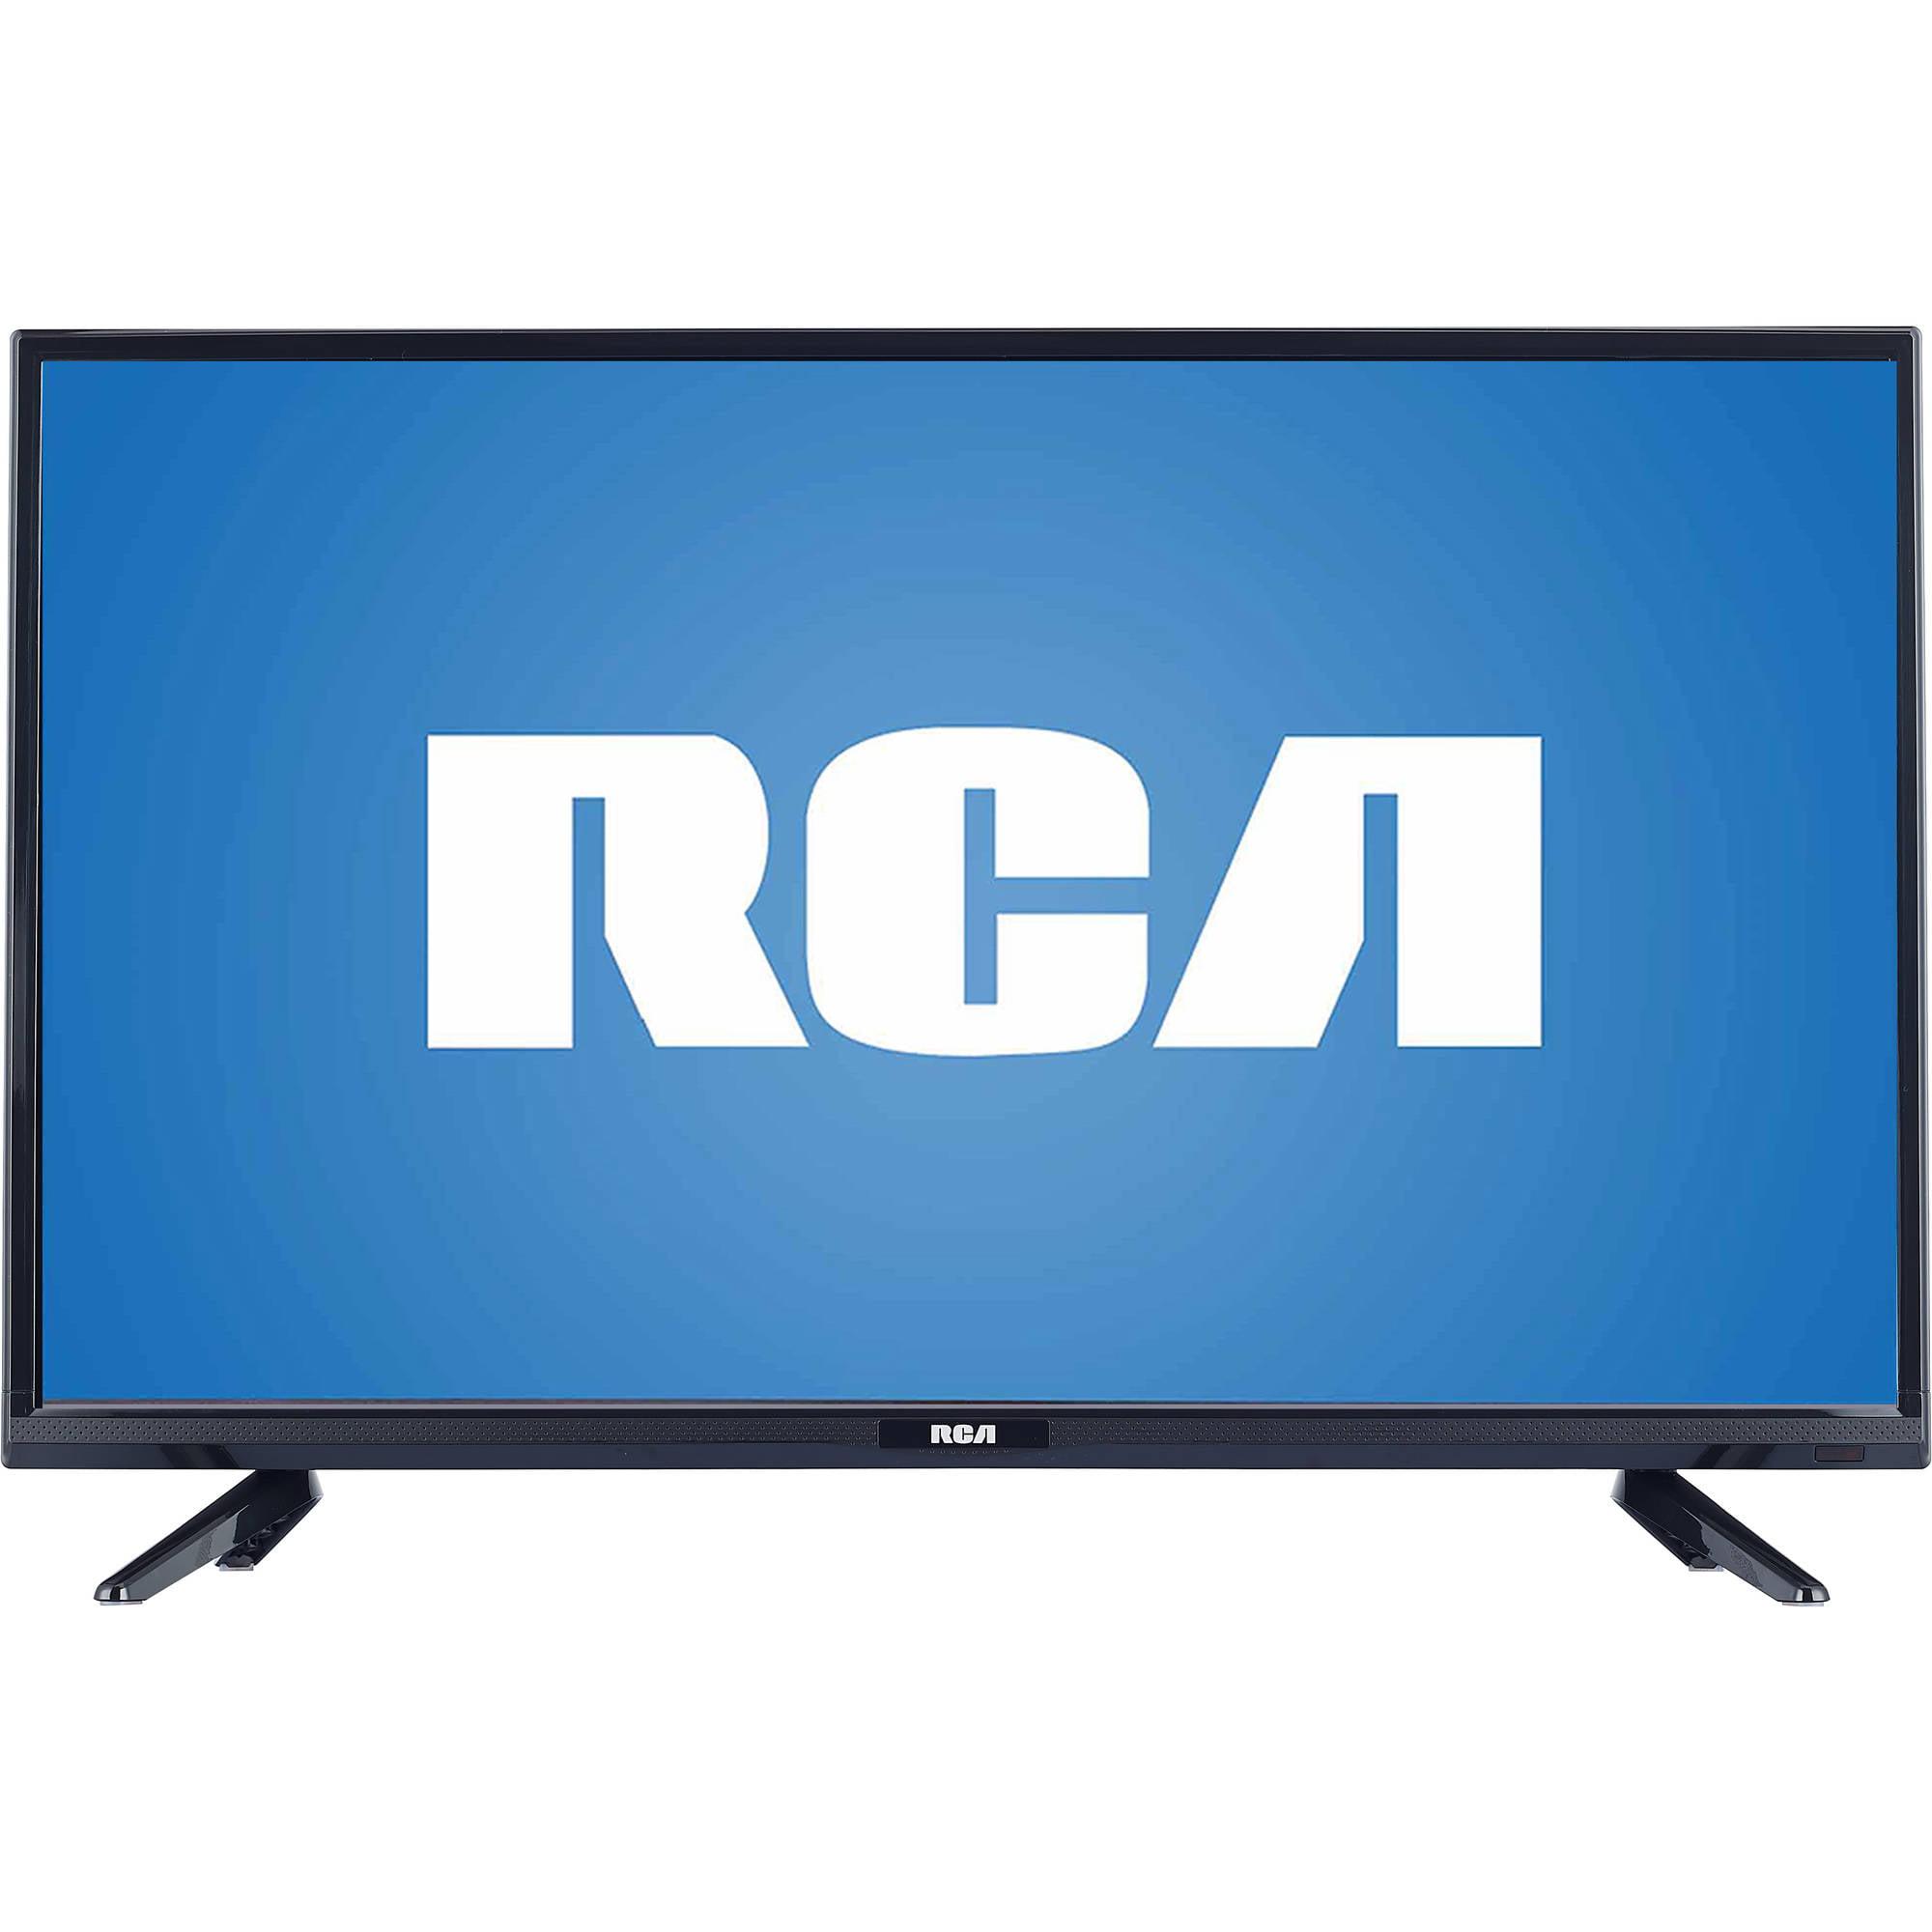 "RCA 32"" Class HD (720P) LED TV with Built-in DVD Player (RLDEDV3255-A) -  Walmart.com"